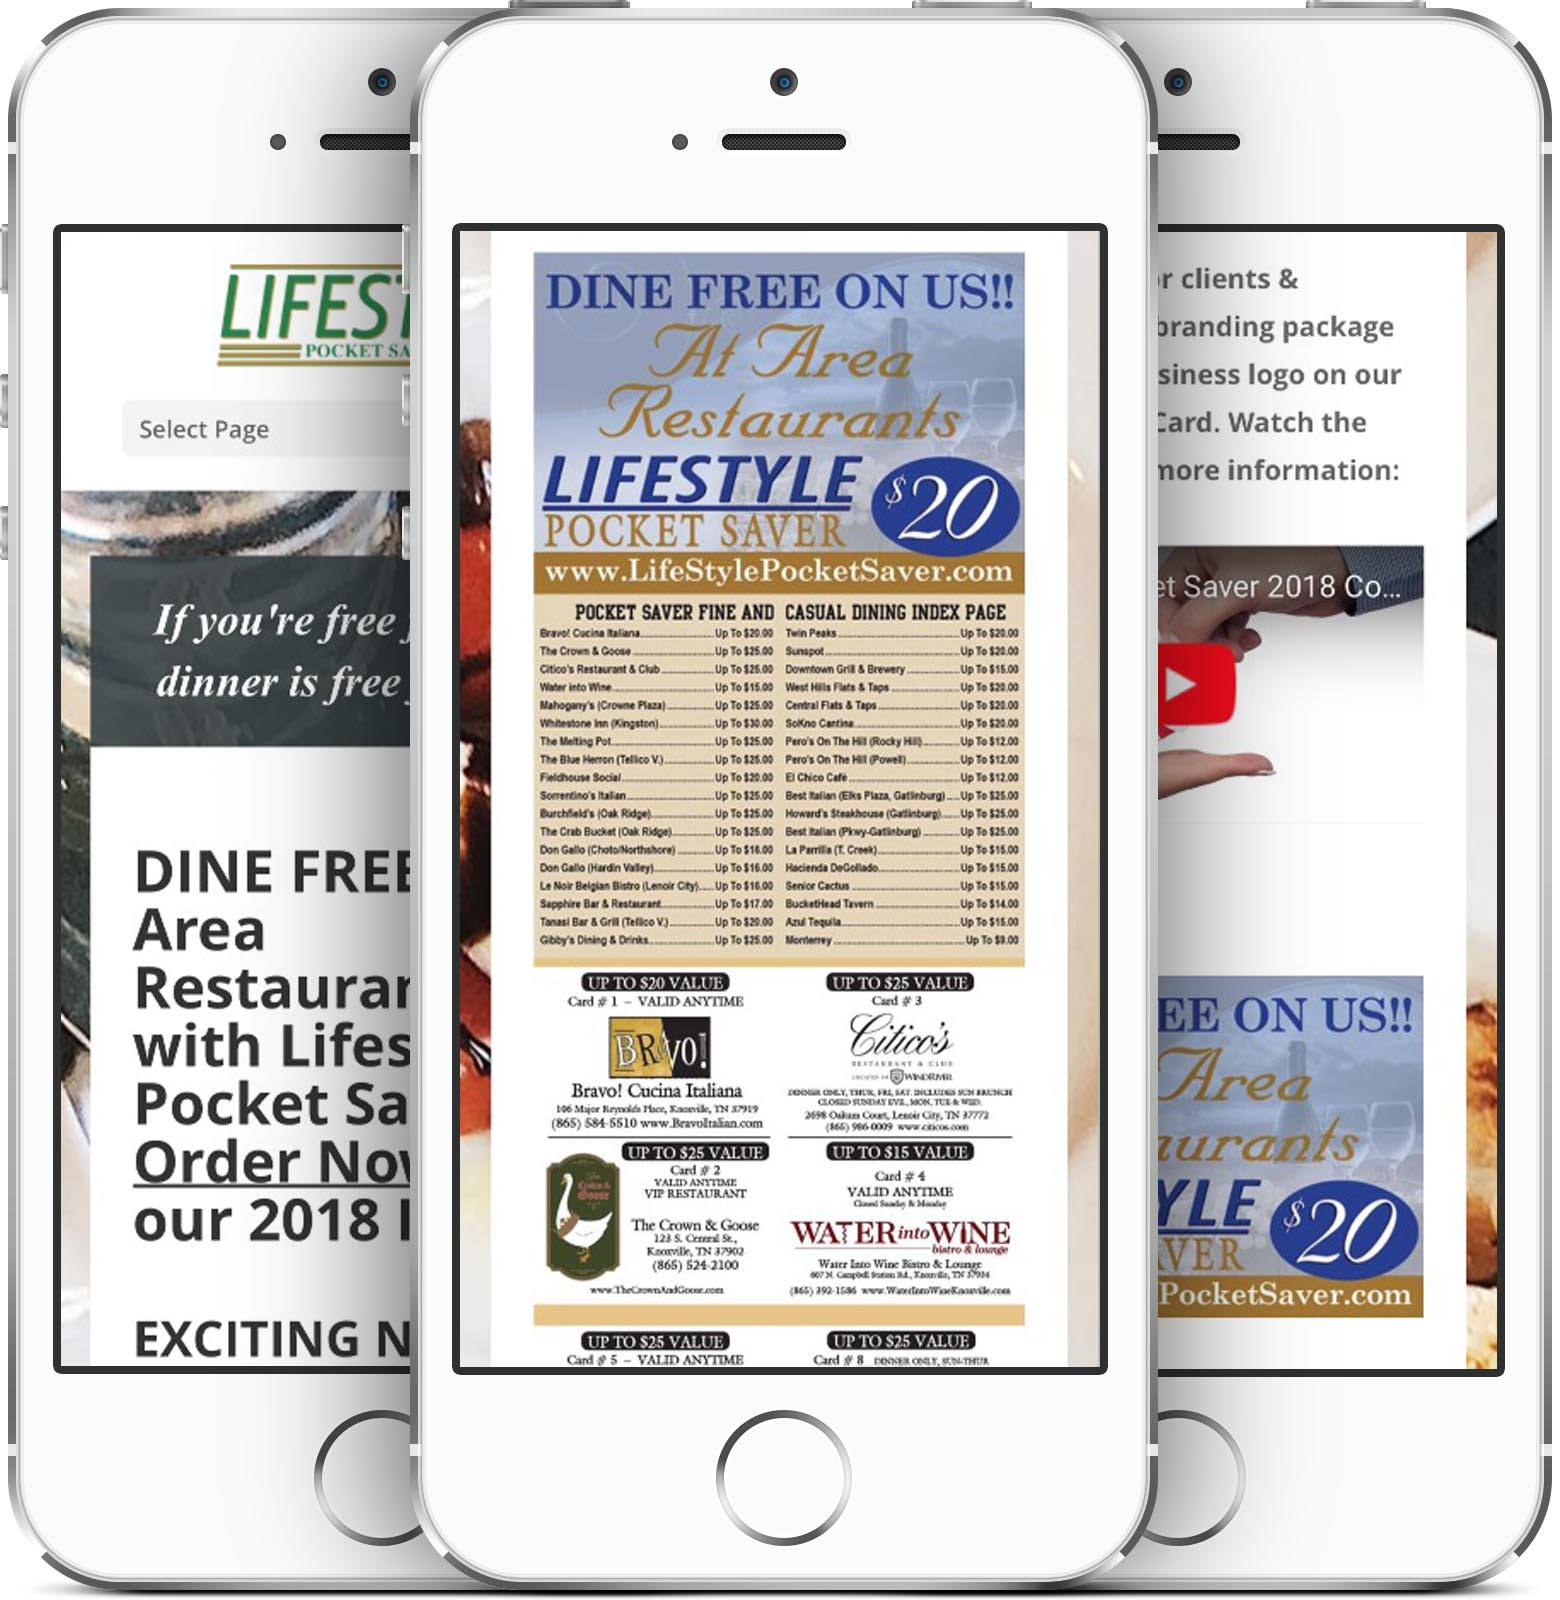 Lifestyle Pocket Saver Mobile-Friendly Web Design